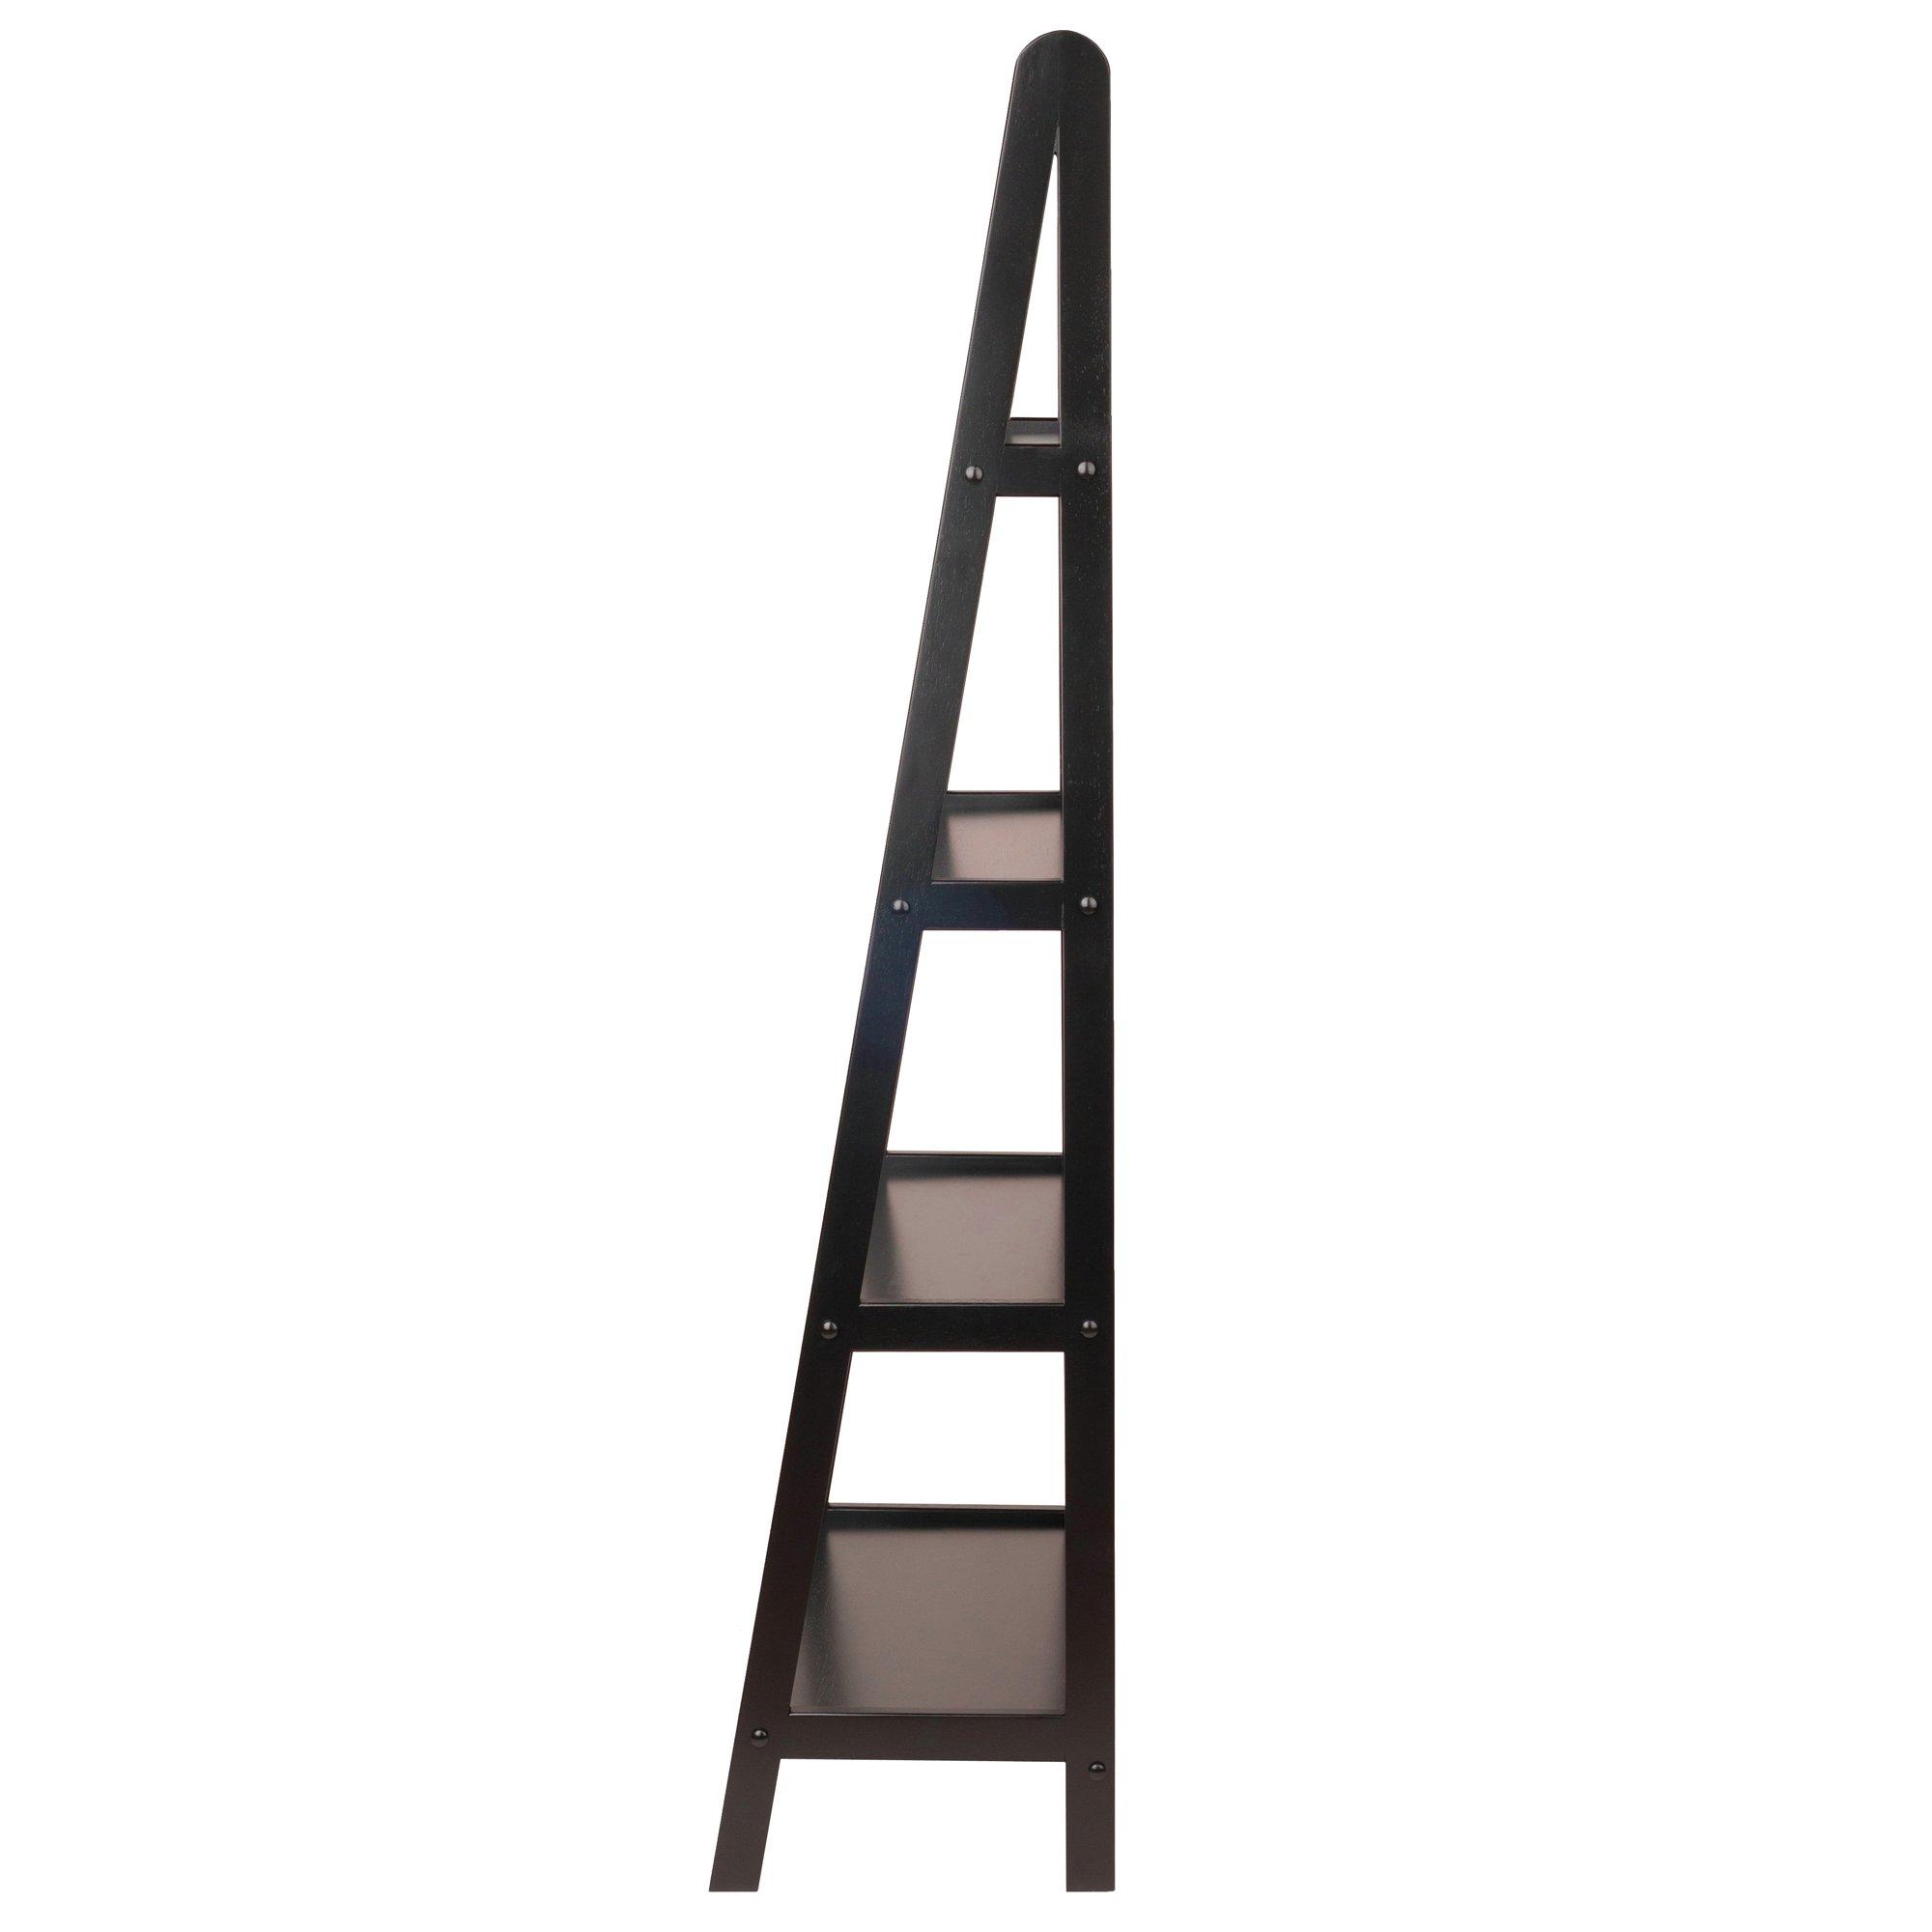 Winsome Wood 4-Tier A-Frame Shelf, Dark Espresso by Winsome Wood (Image #4)